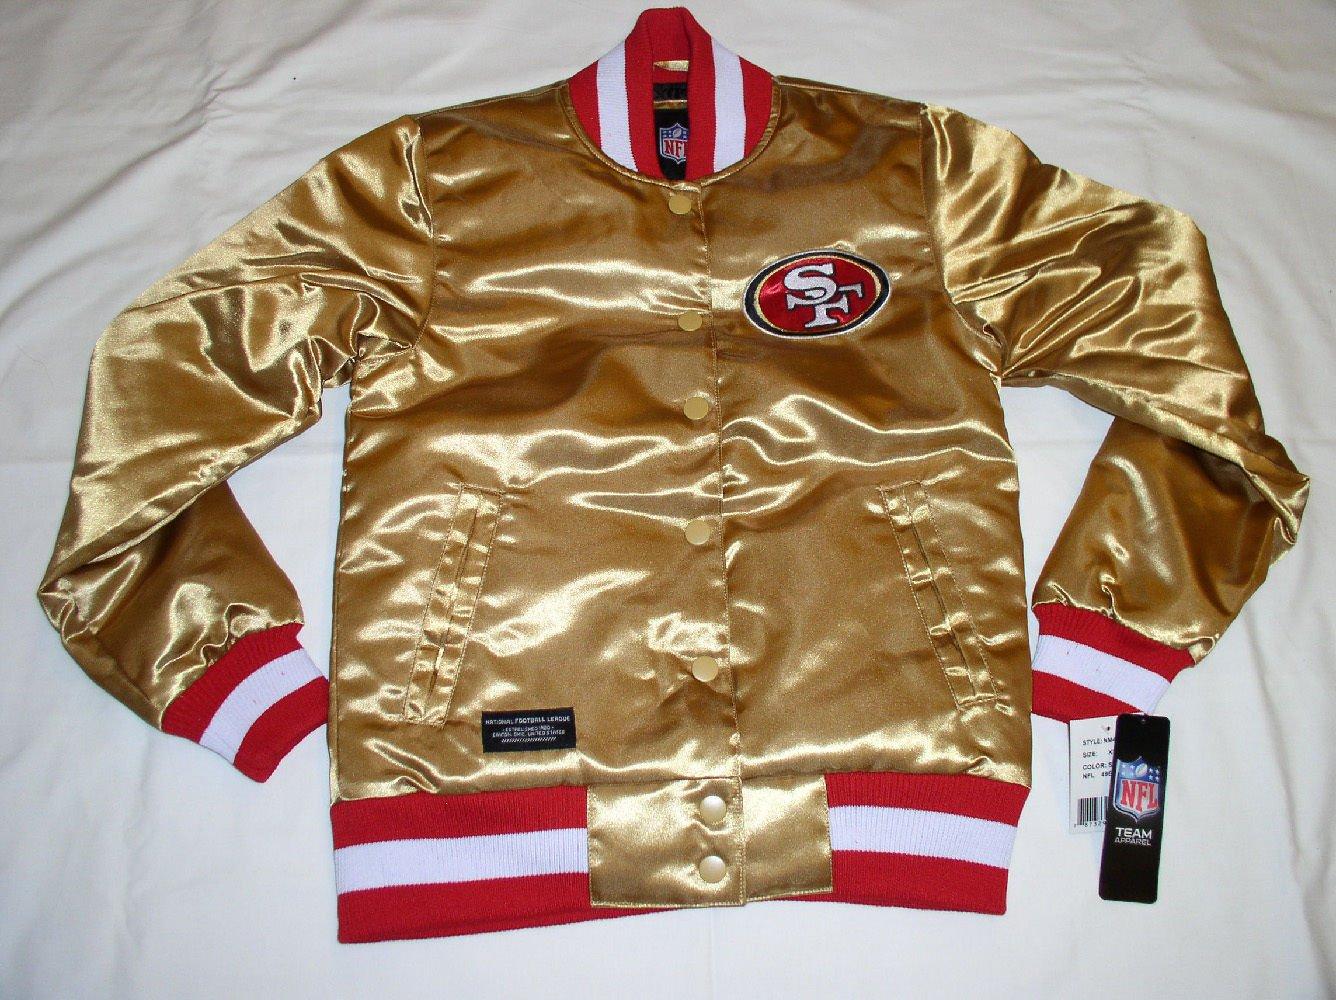 info for 56c7f 46af2 Amazon.com : G-III Sports Women Ladies San Francisco 49ers ...